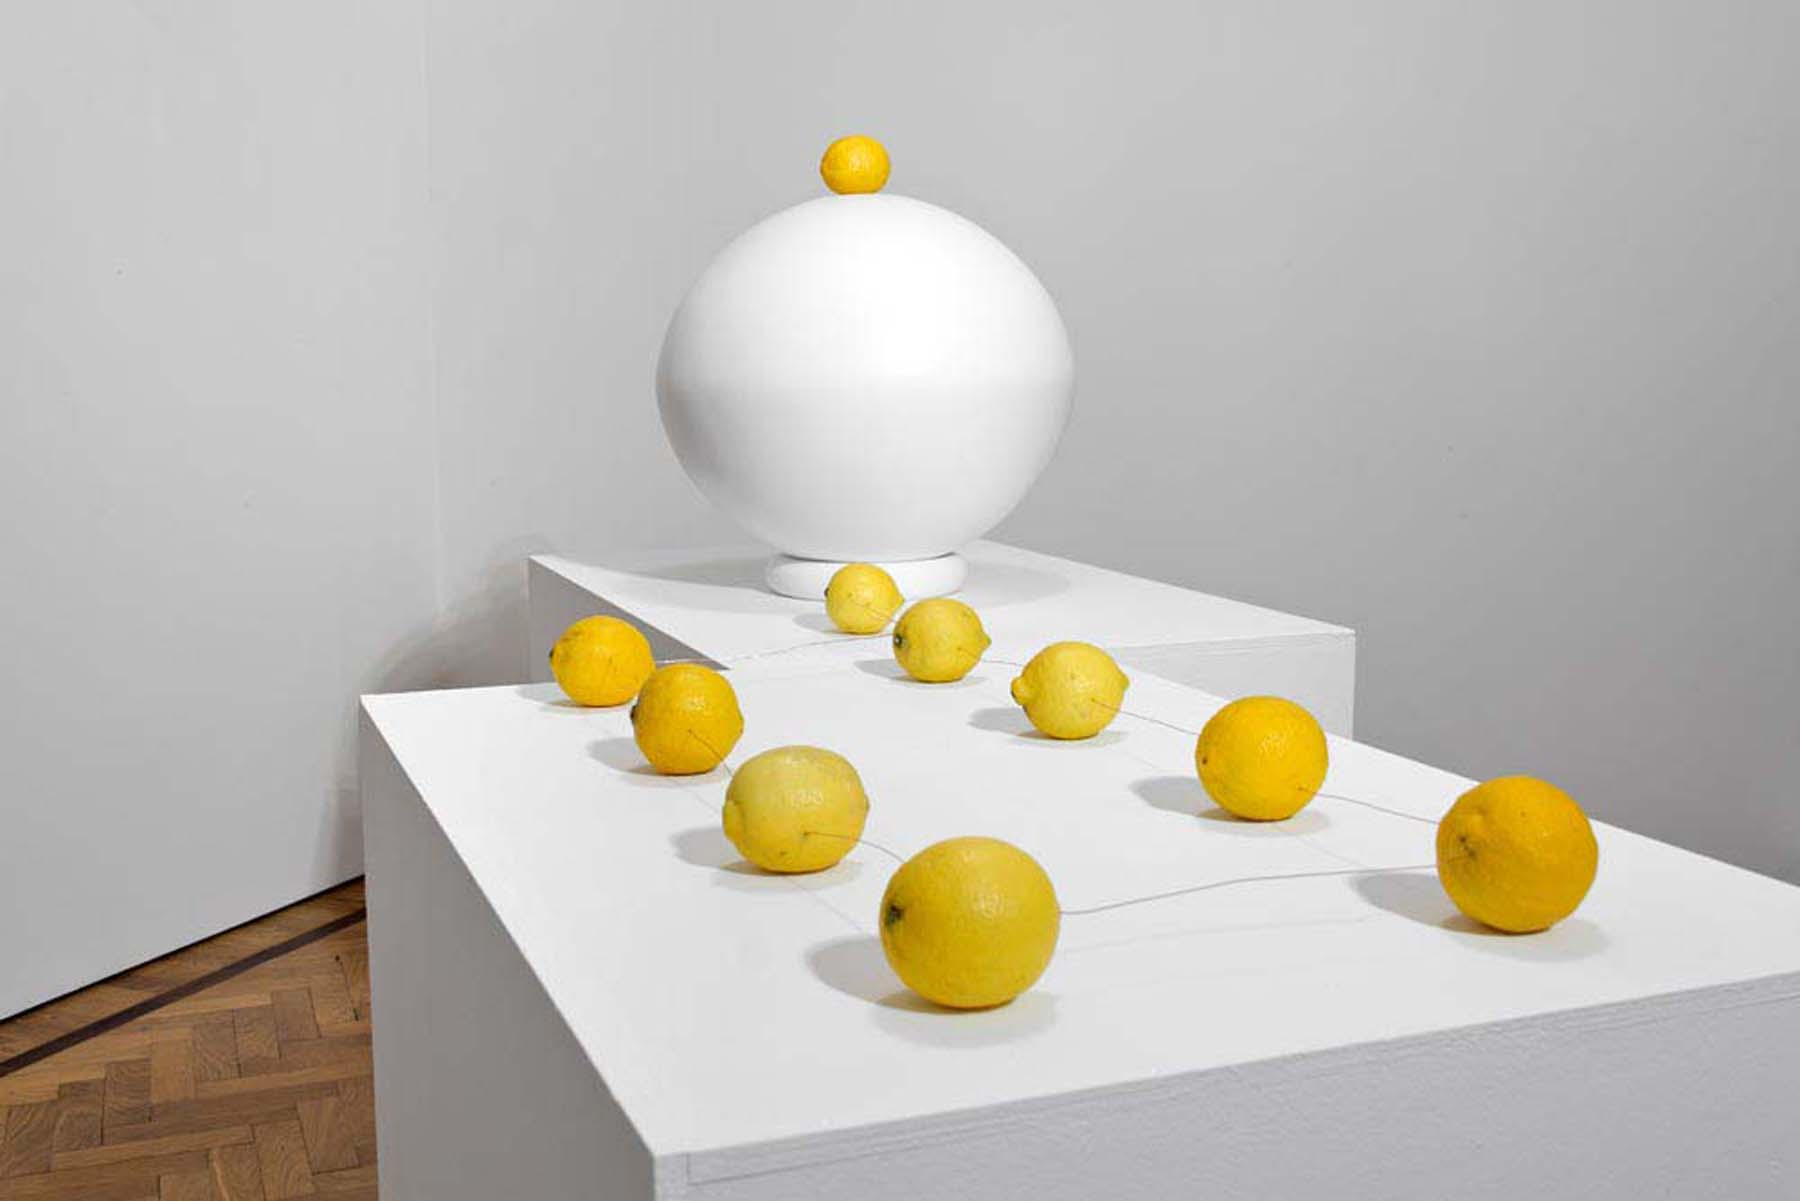 Michele Spanghero, Natura morta (Citron), 2013. Photo Silvia Longhi